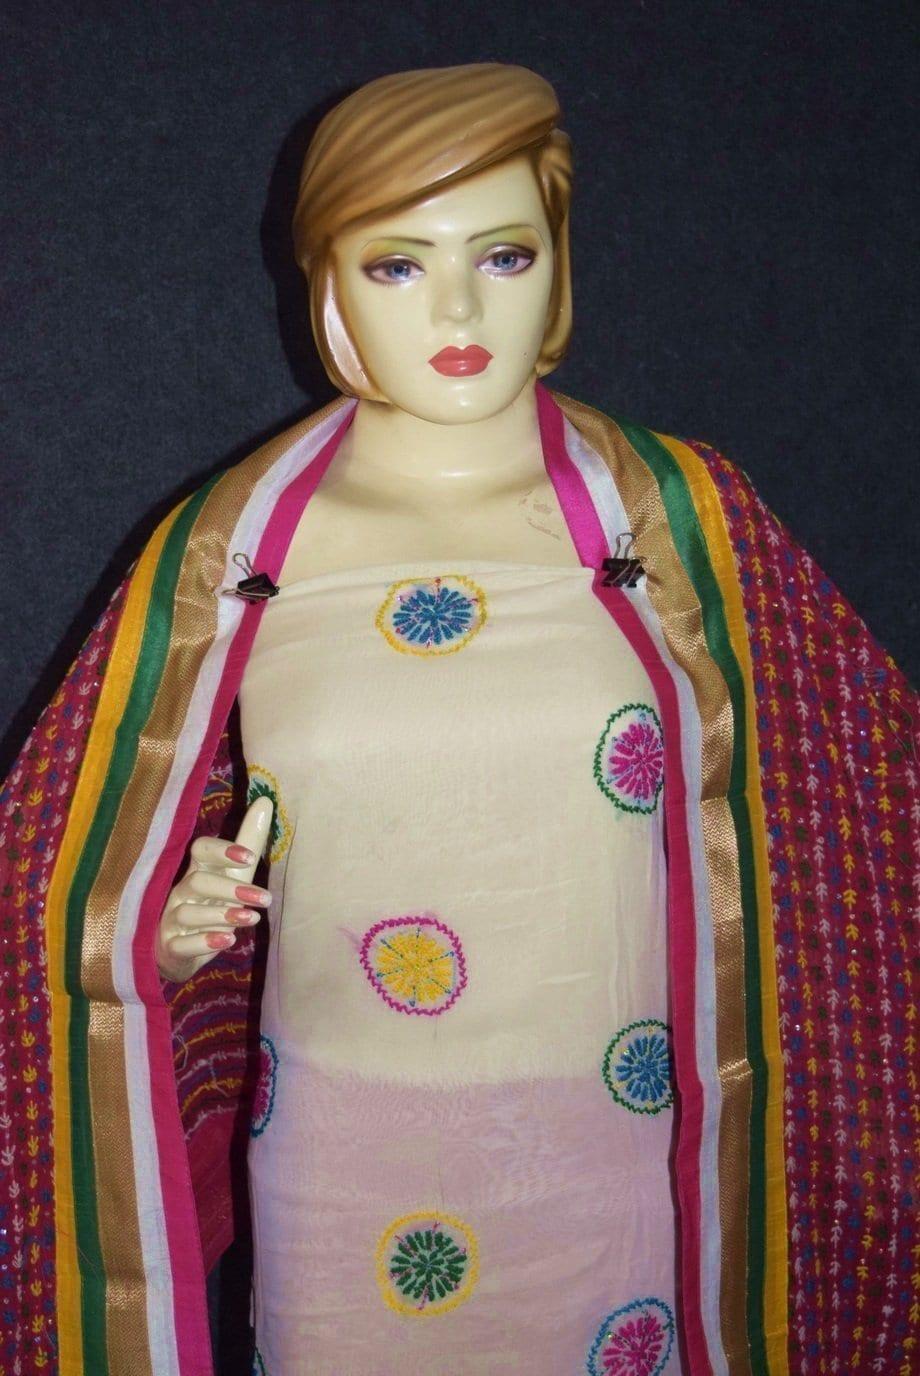 Party Wear Georgette hand Embroidered Salwar kameez stole suit set F0657 2